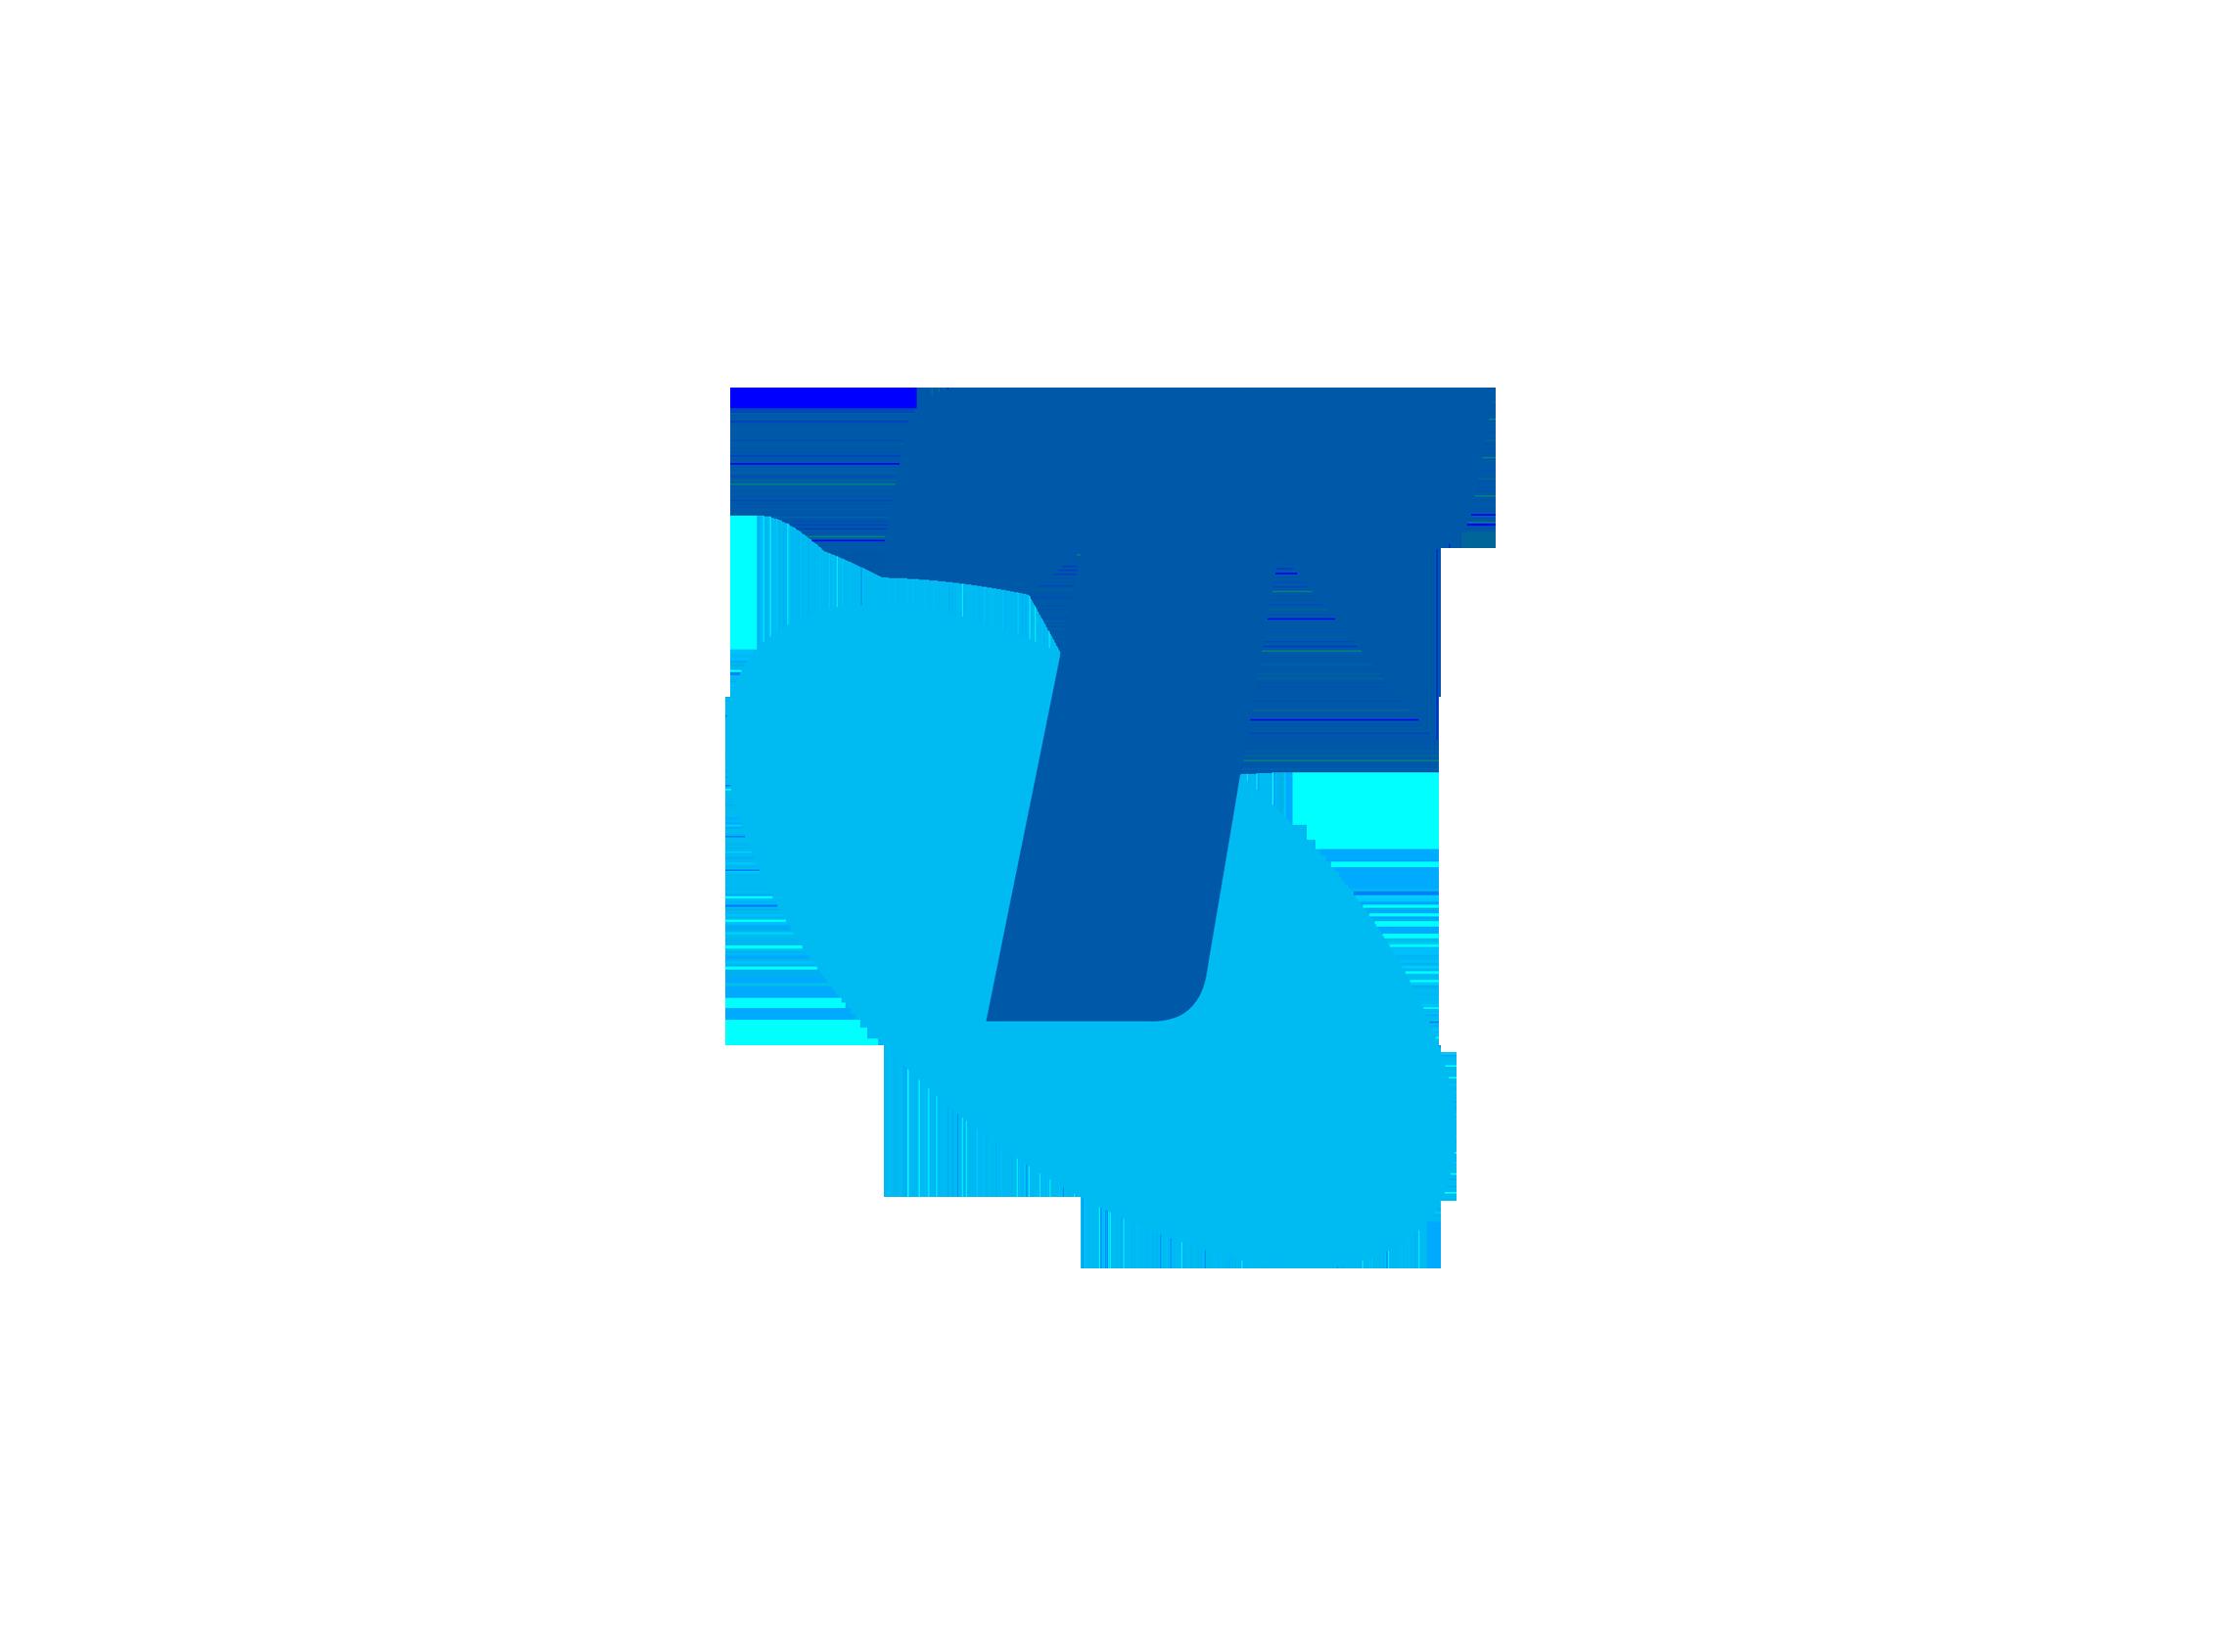 Telstra-logo-2011-blue.png